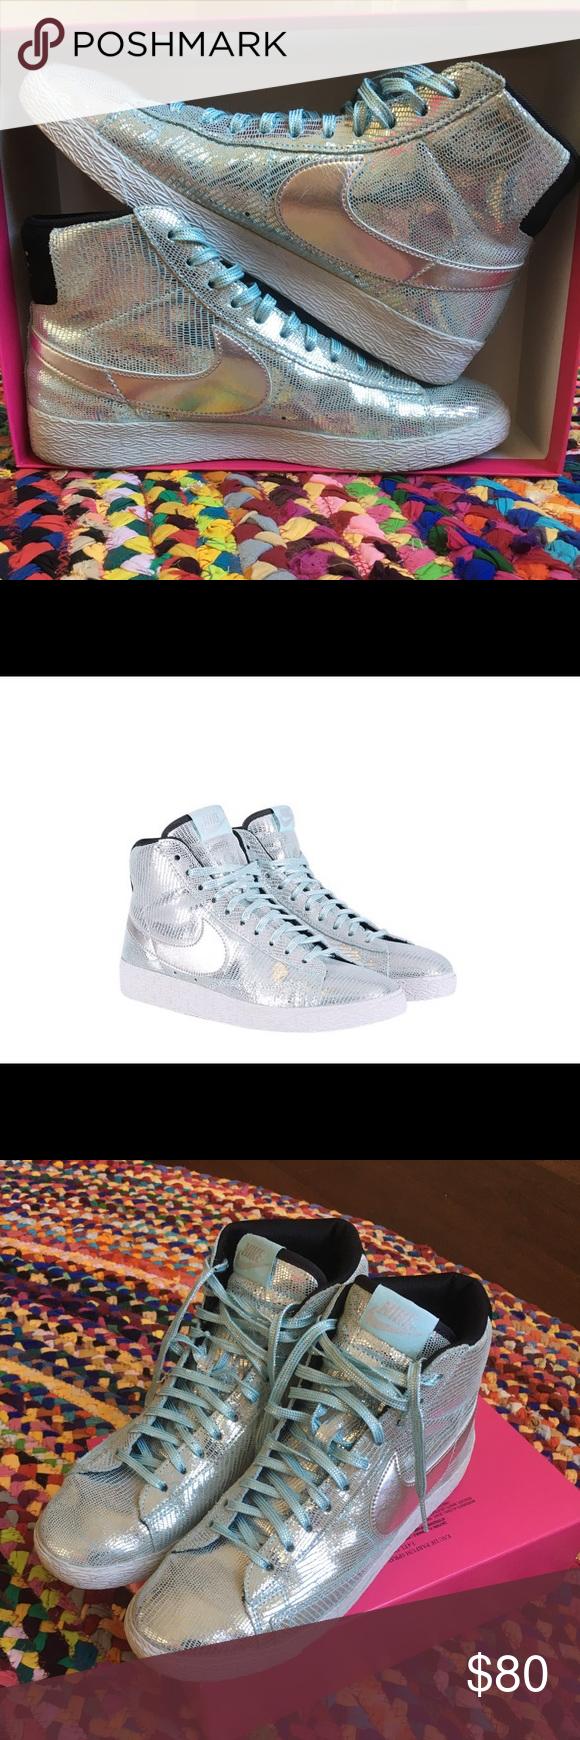 "Nike ""disco ball"" Blazer MID QZ women's sneakers Brand new"